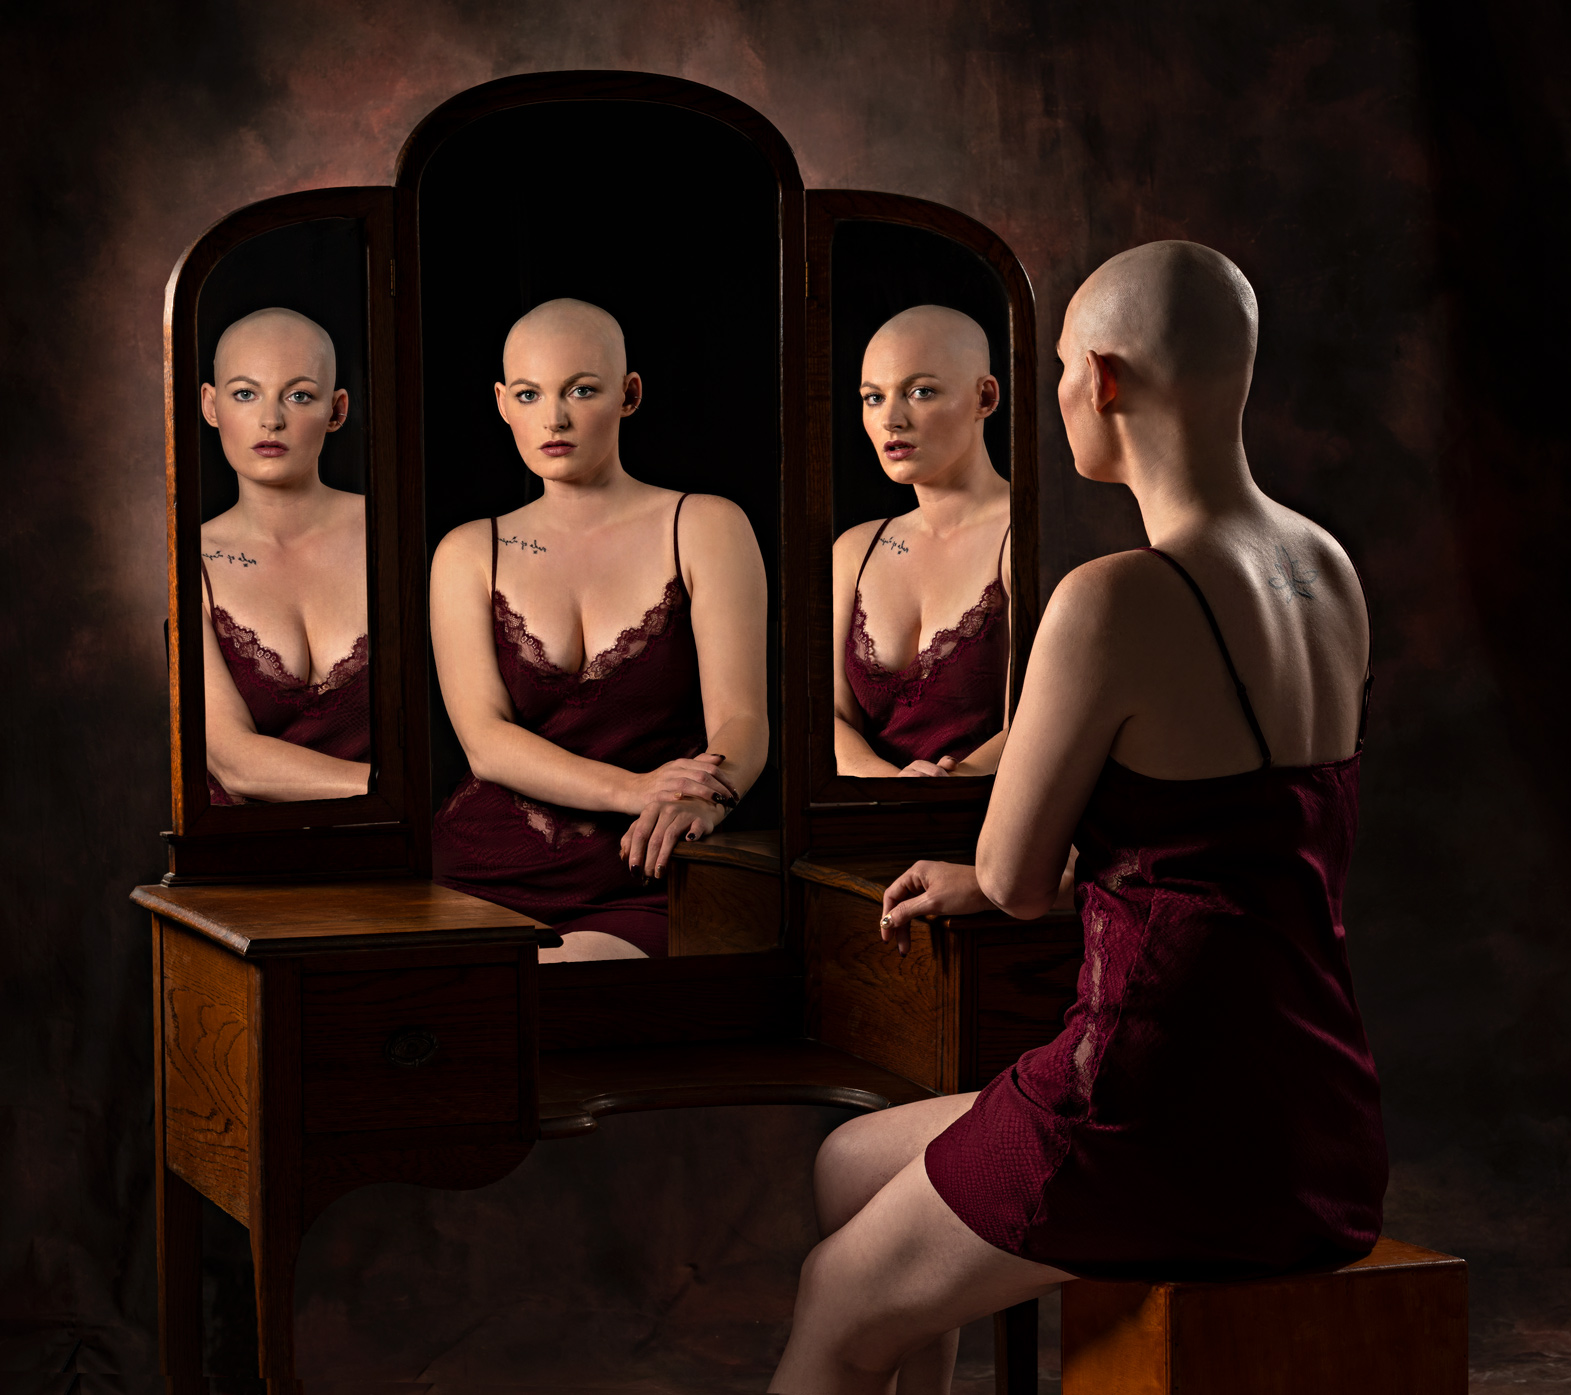 fashion photography of lingerie sleepwear